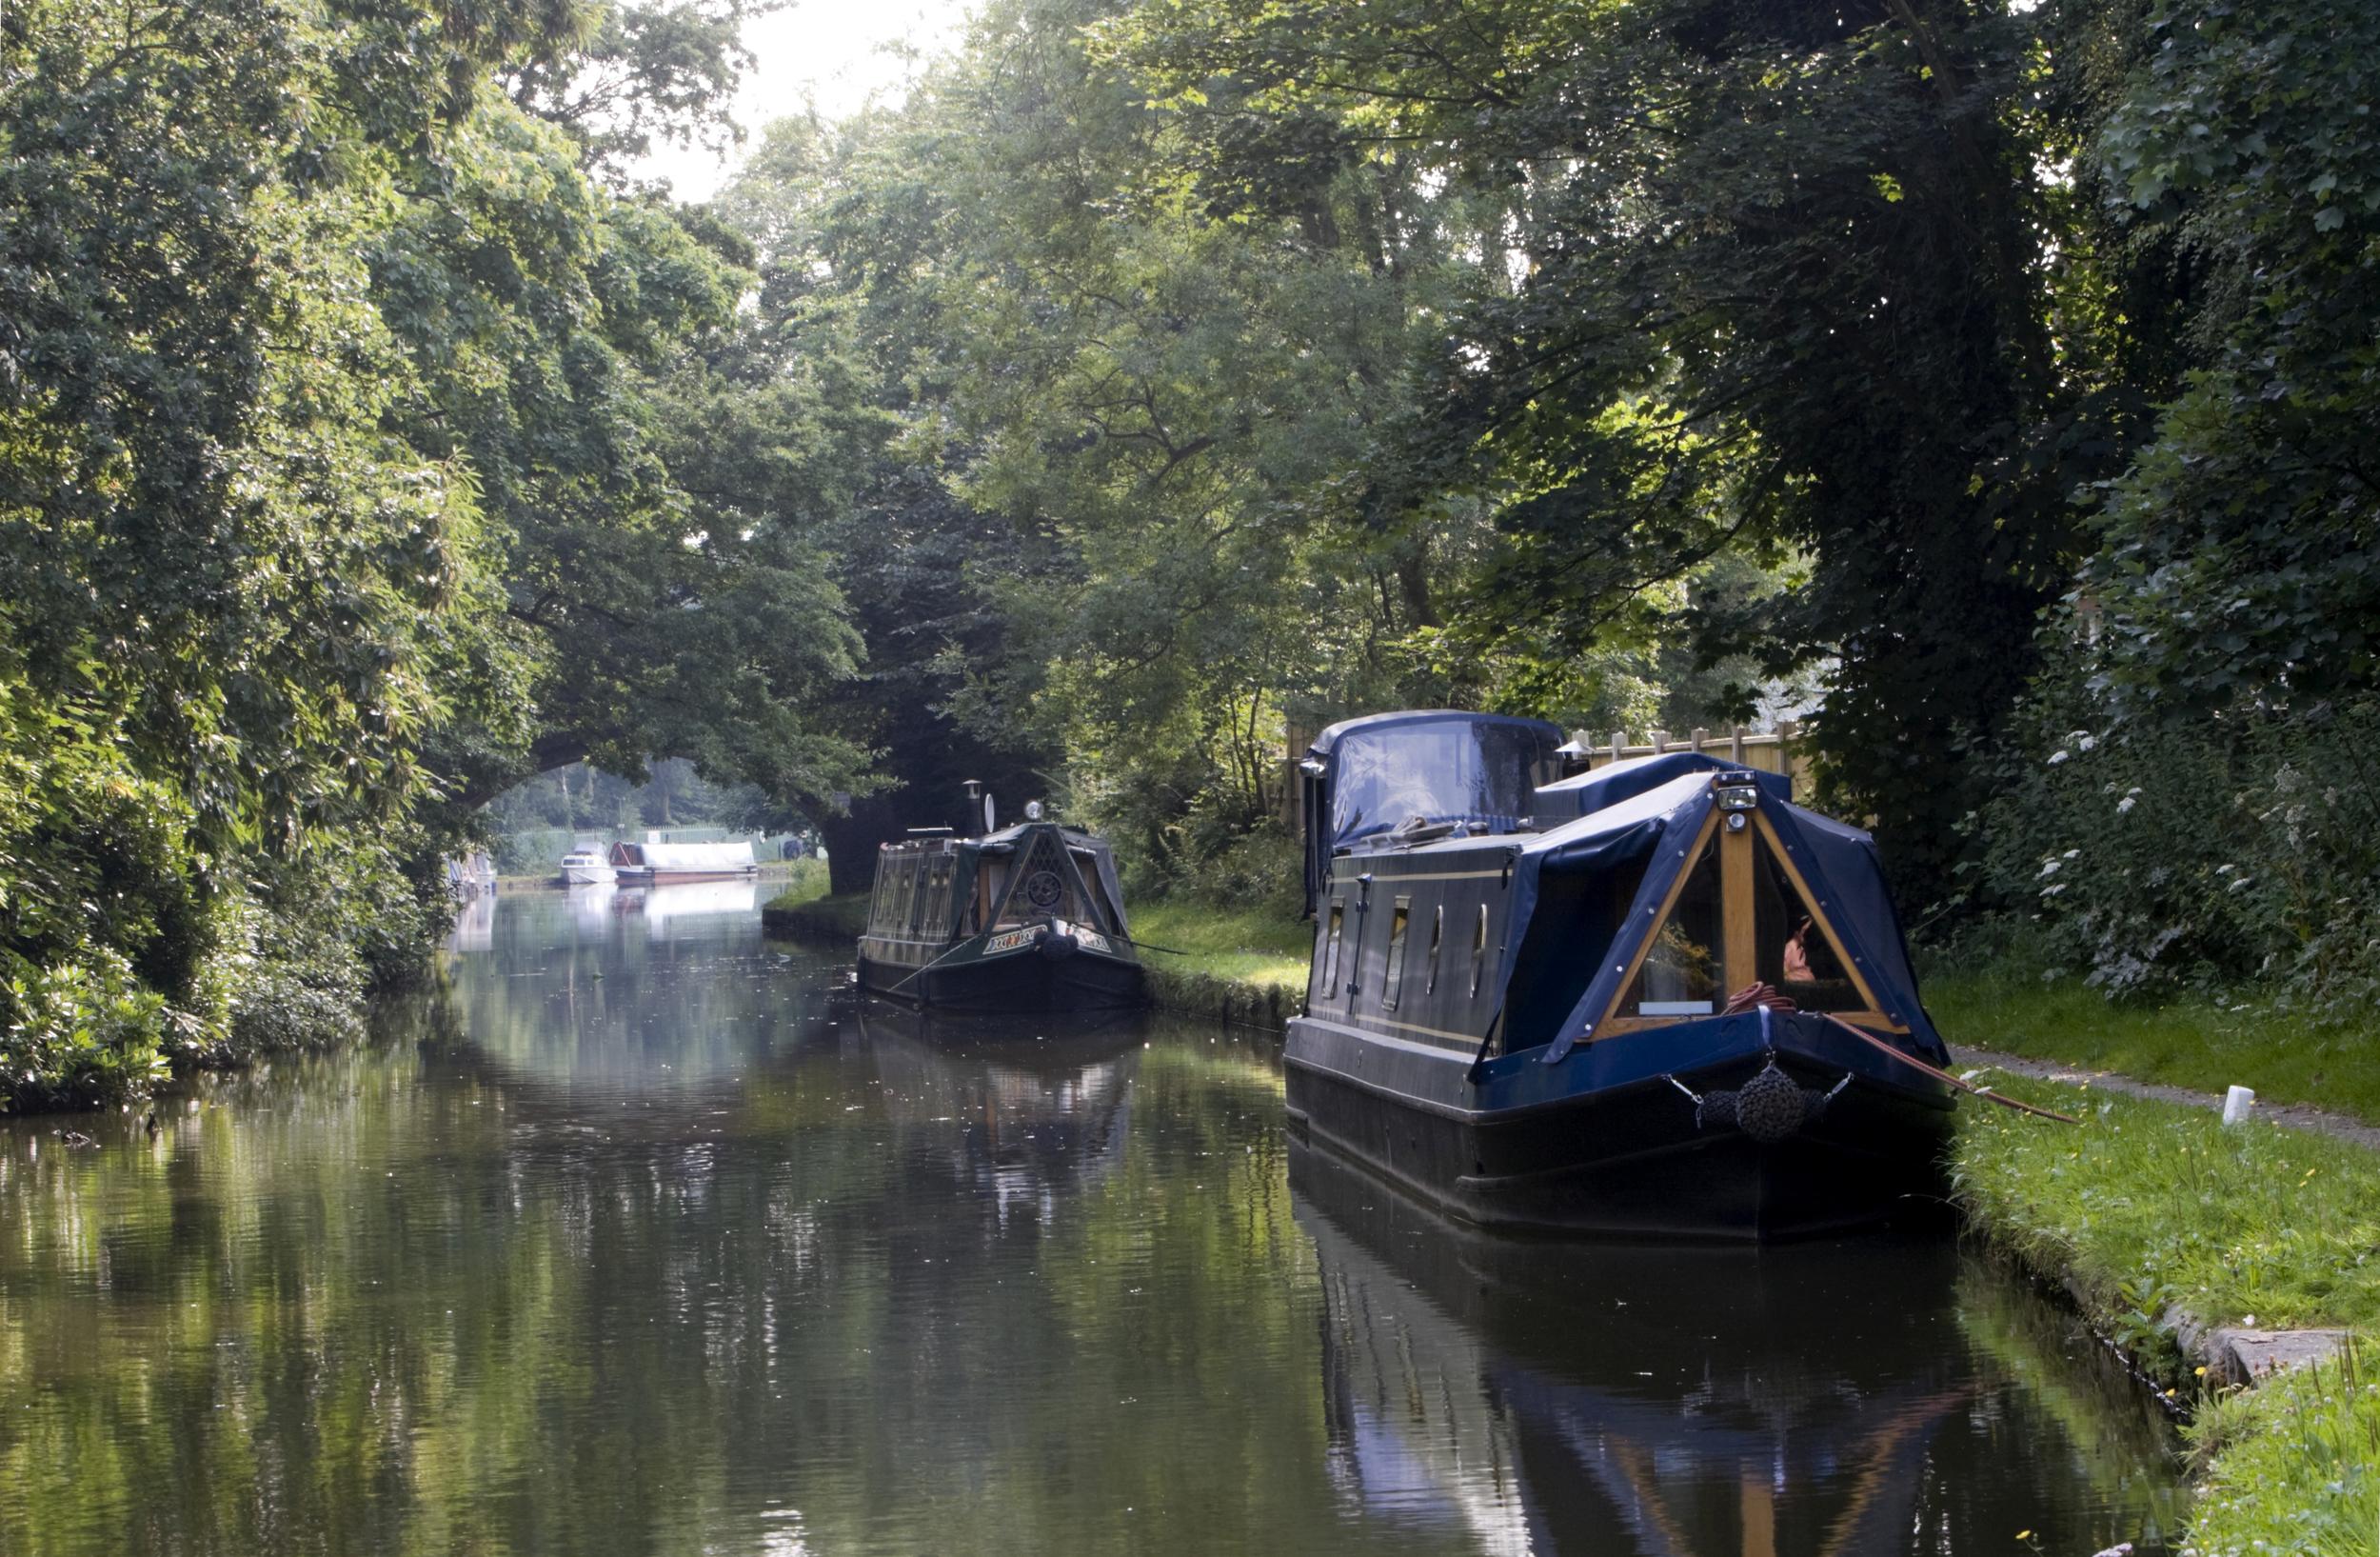 White_Mills_Marina_boats_moored.jpg